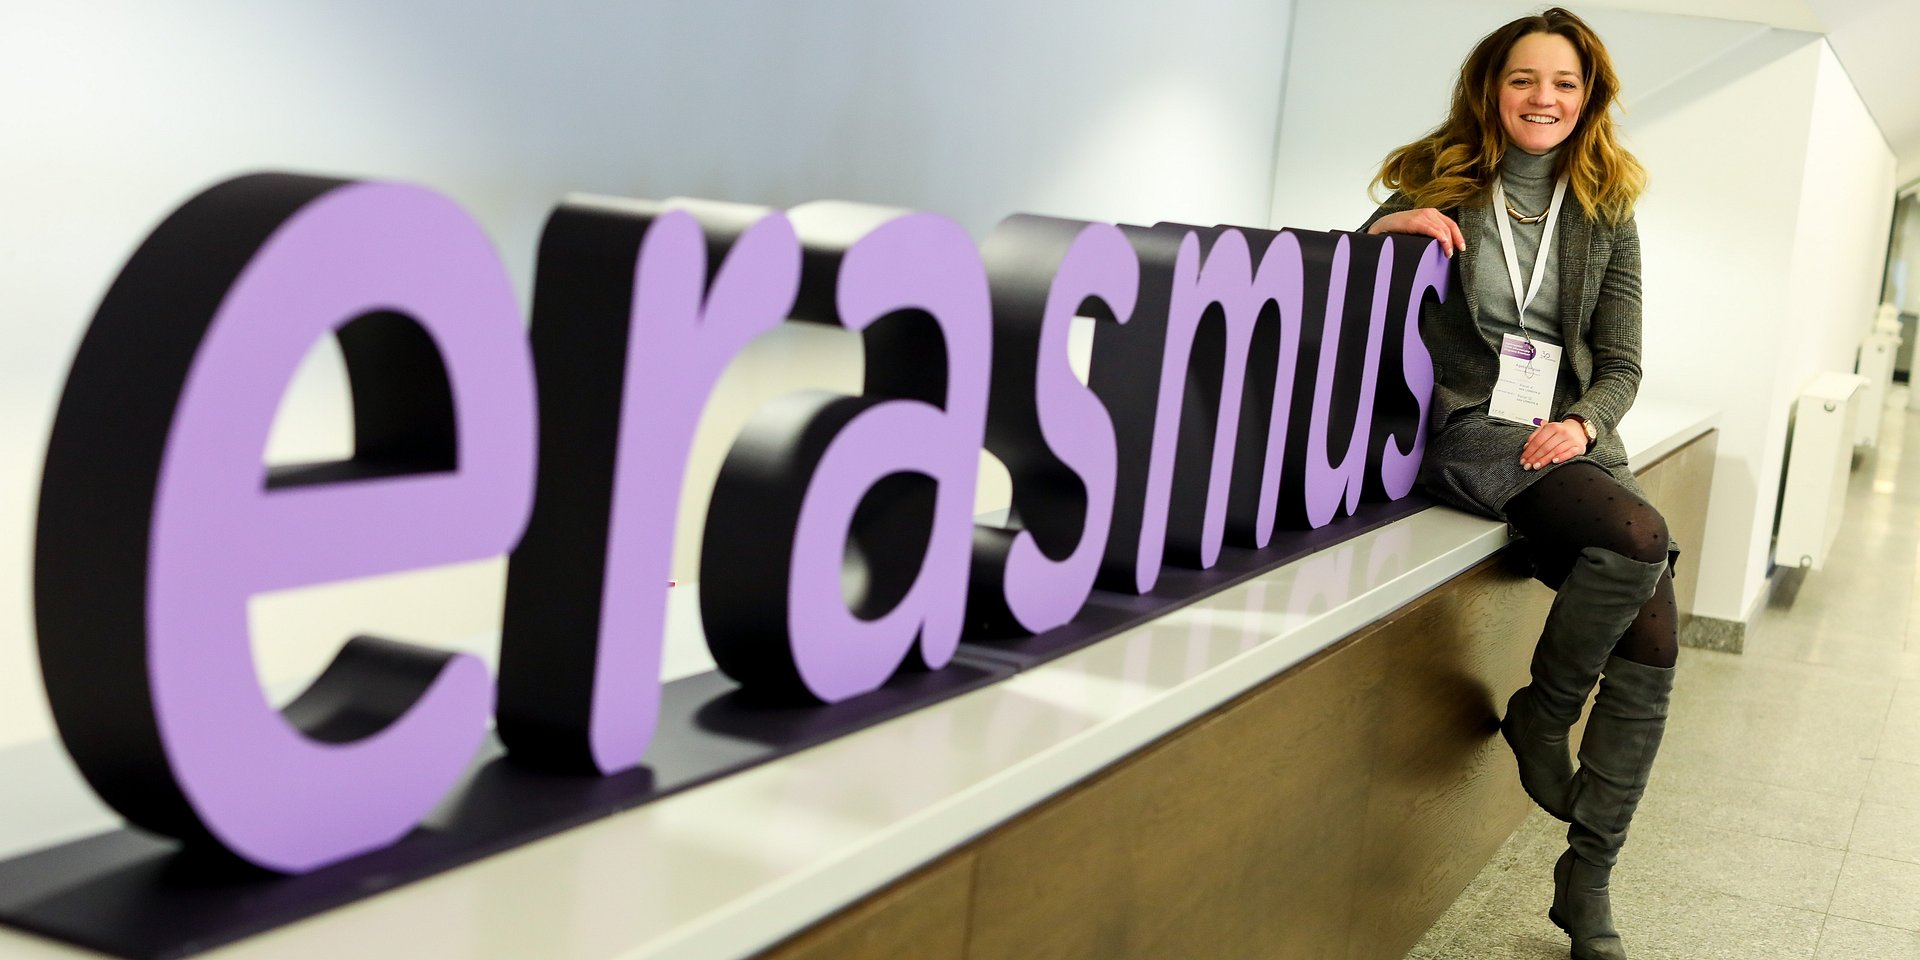 Erasmus+ - 3 mld euro w 2019 r.